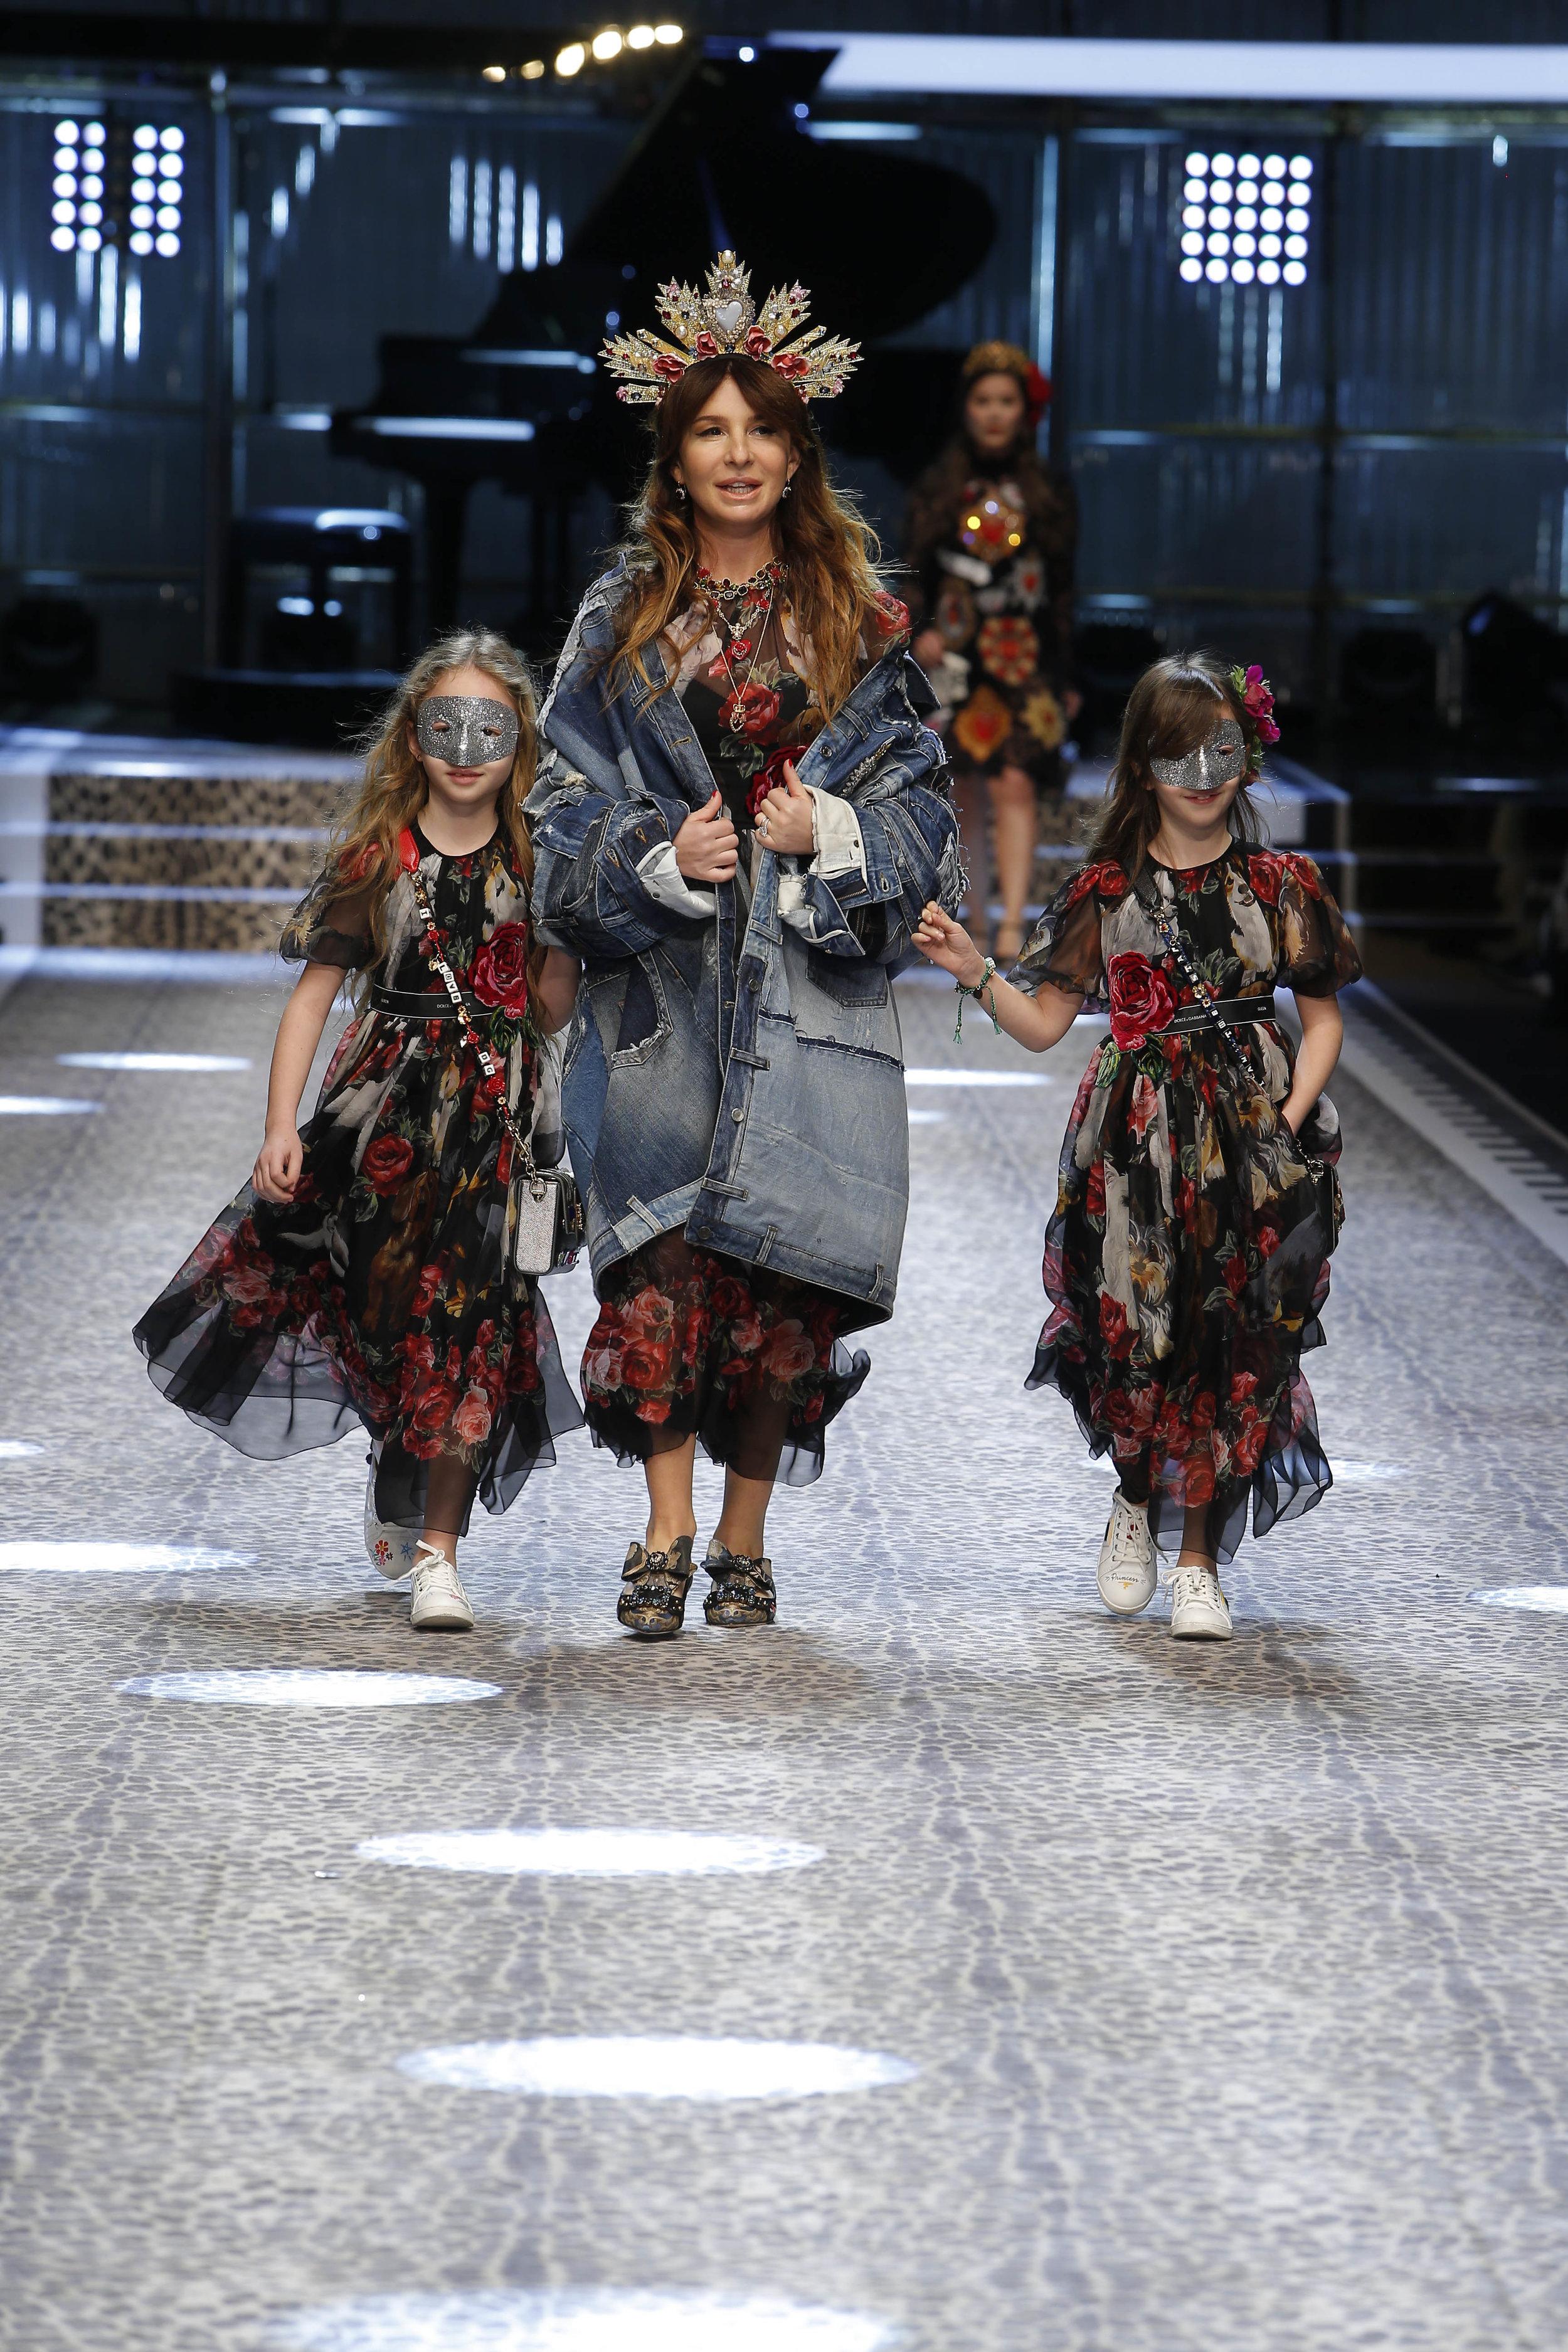 Dolce&Gabbana_women's fashion show fw17-18_Runway_images (70).jpg